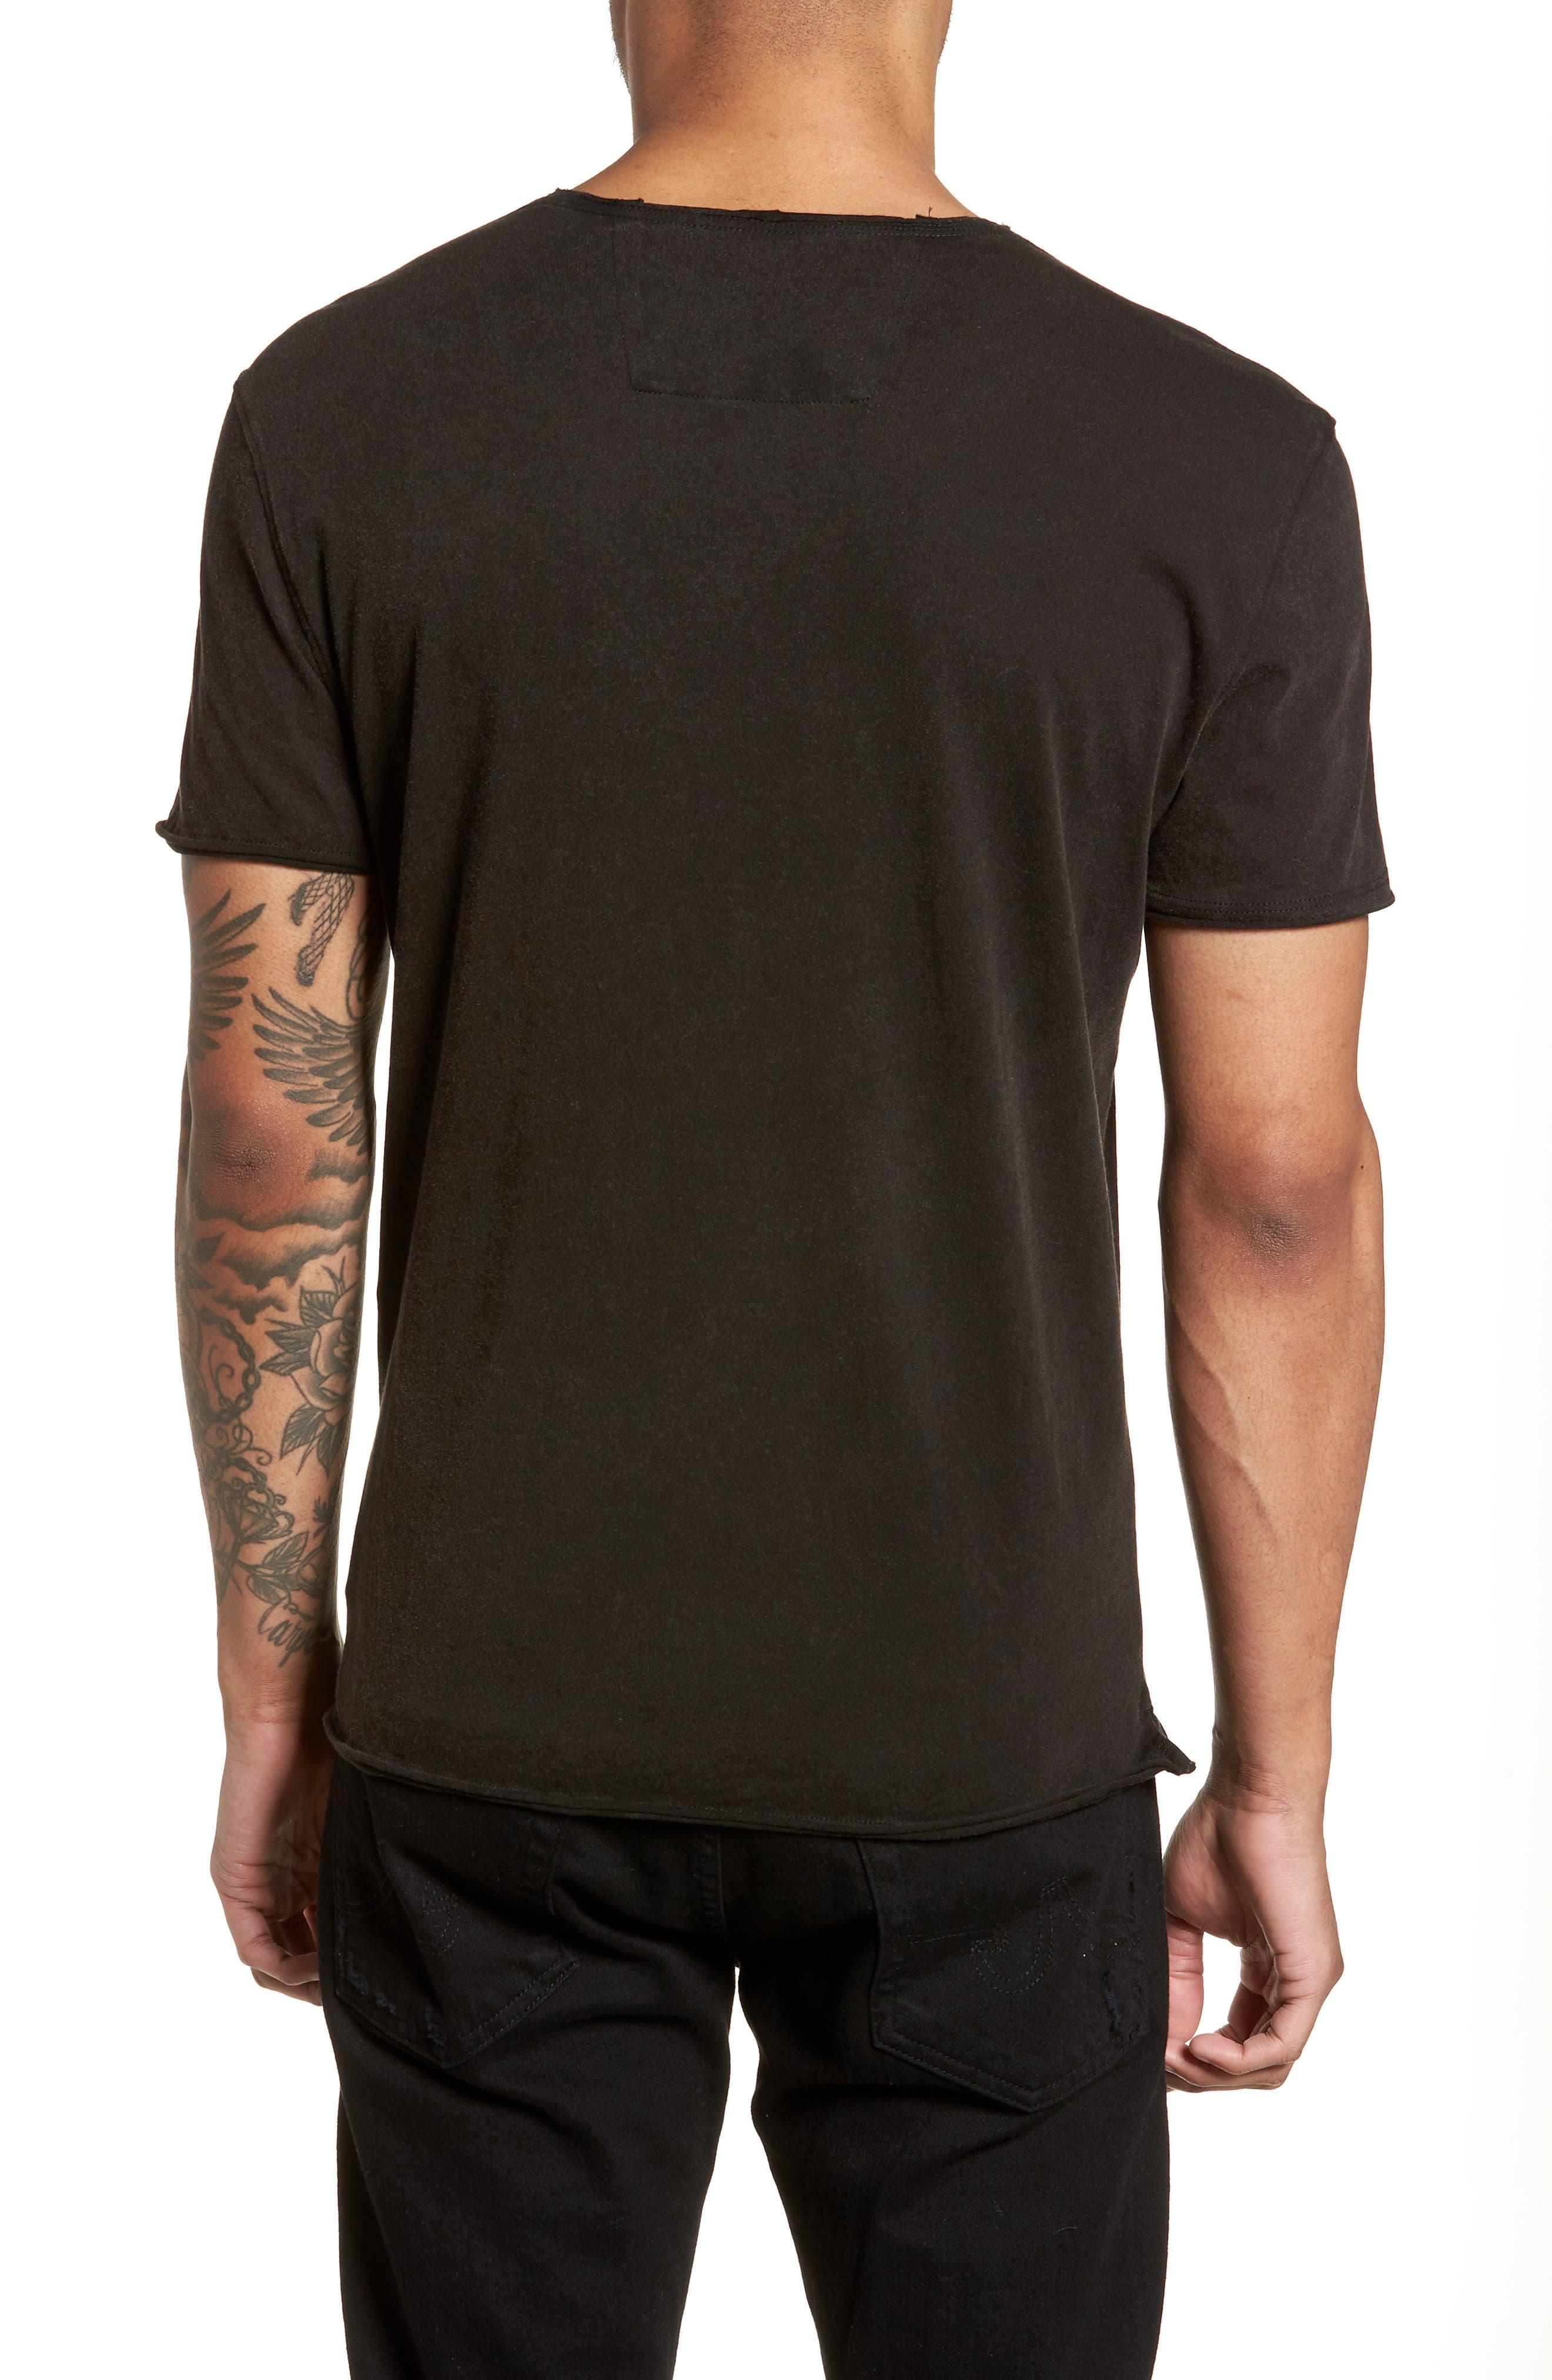 Doors Crewneck T-Shirt,                             Alternate thumbnail 2, color,                             BLACK